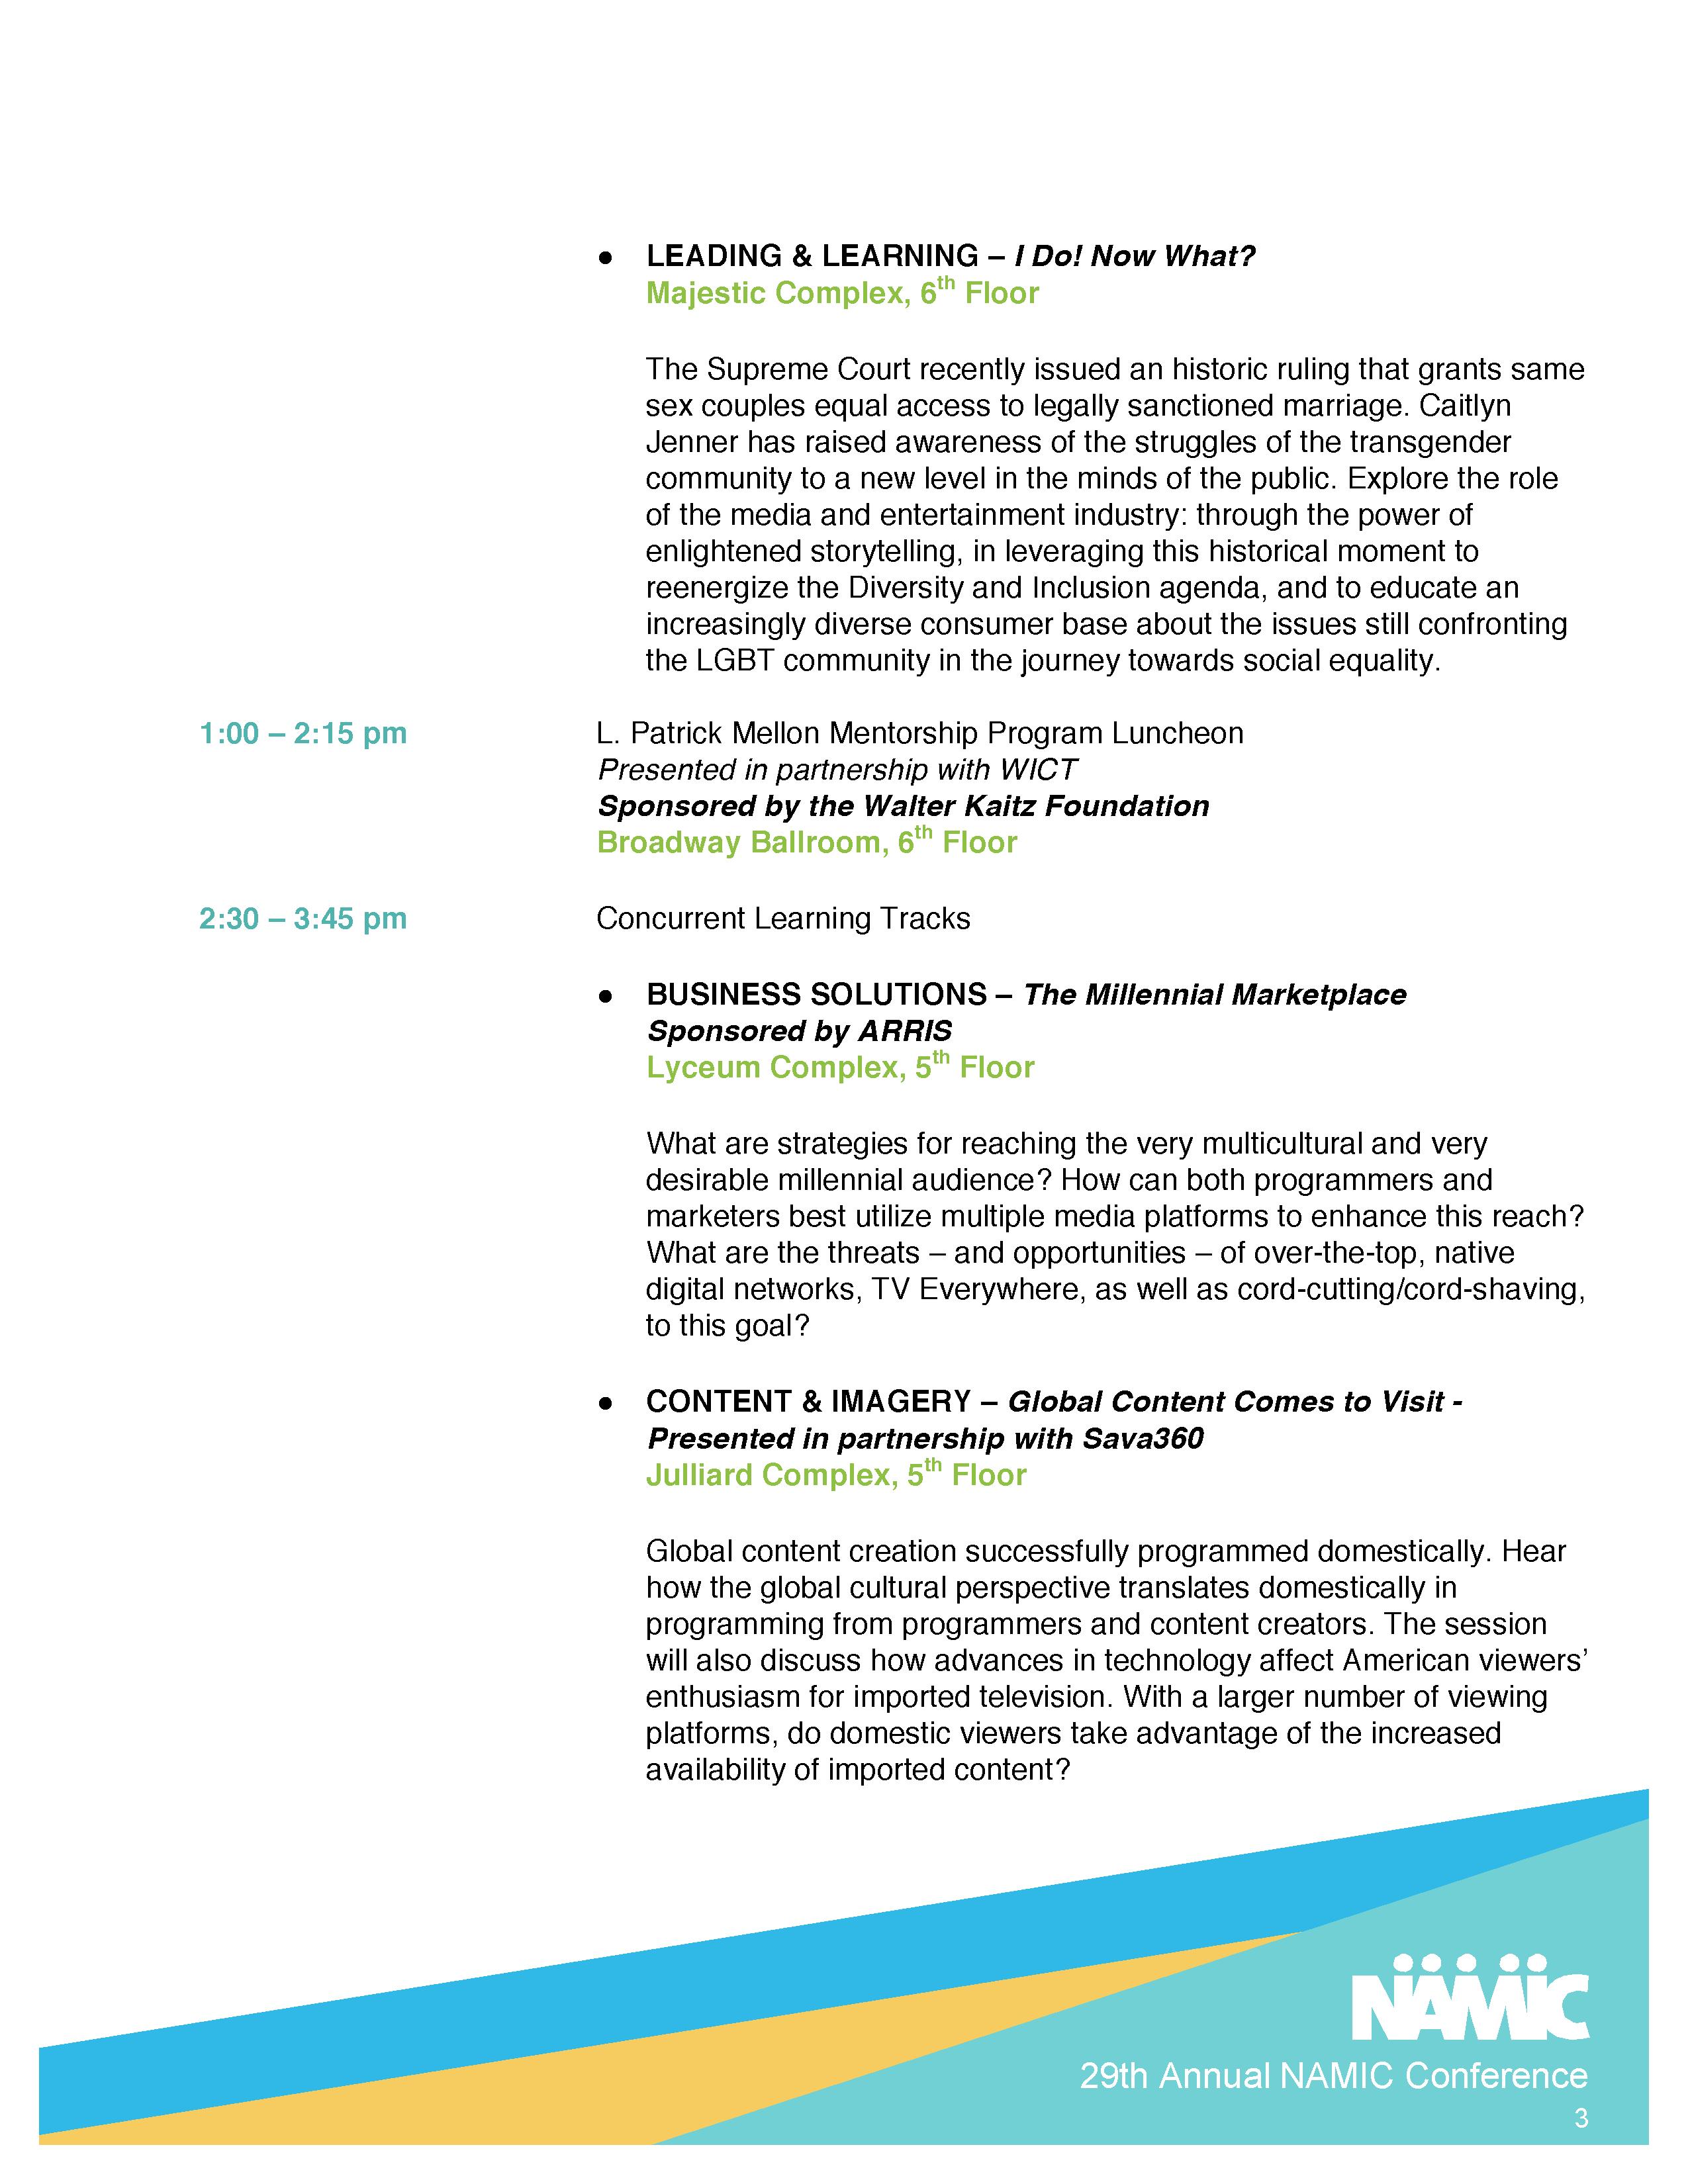 NAMIC | 29th Annual NAMIC Conference Agenda